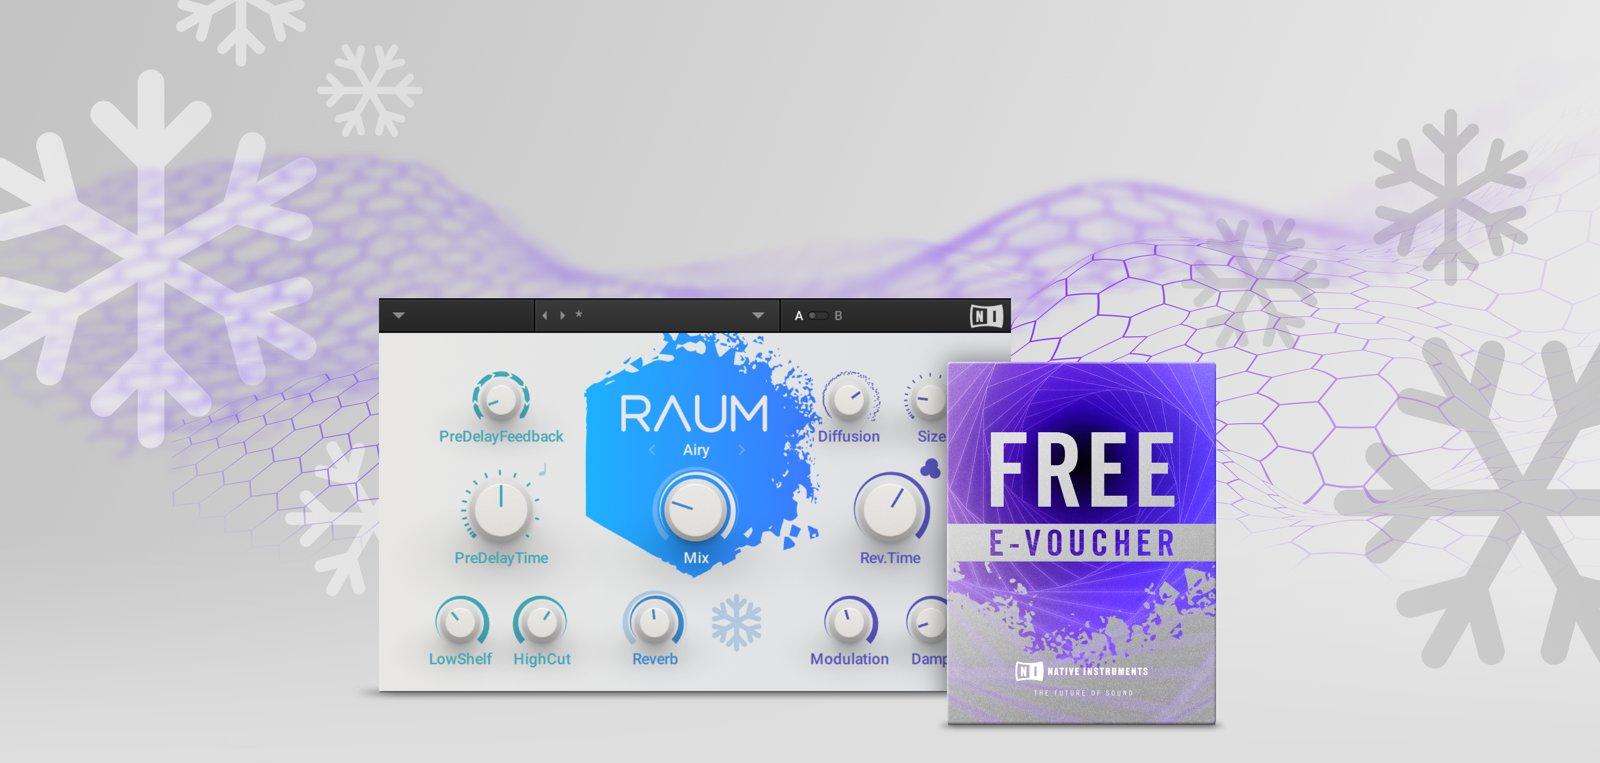 £22.00 e-voucher at Native Instuments & Free new reverb RAUM software